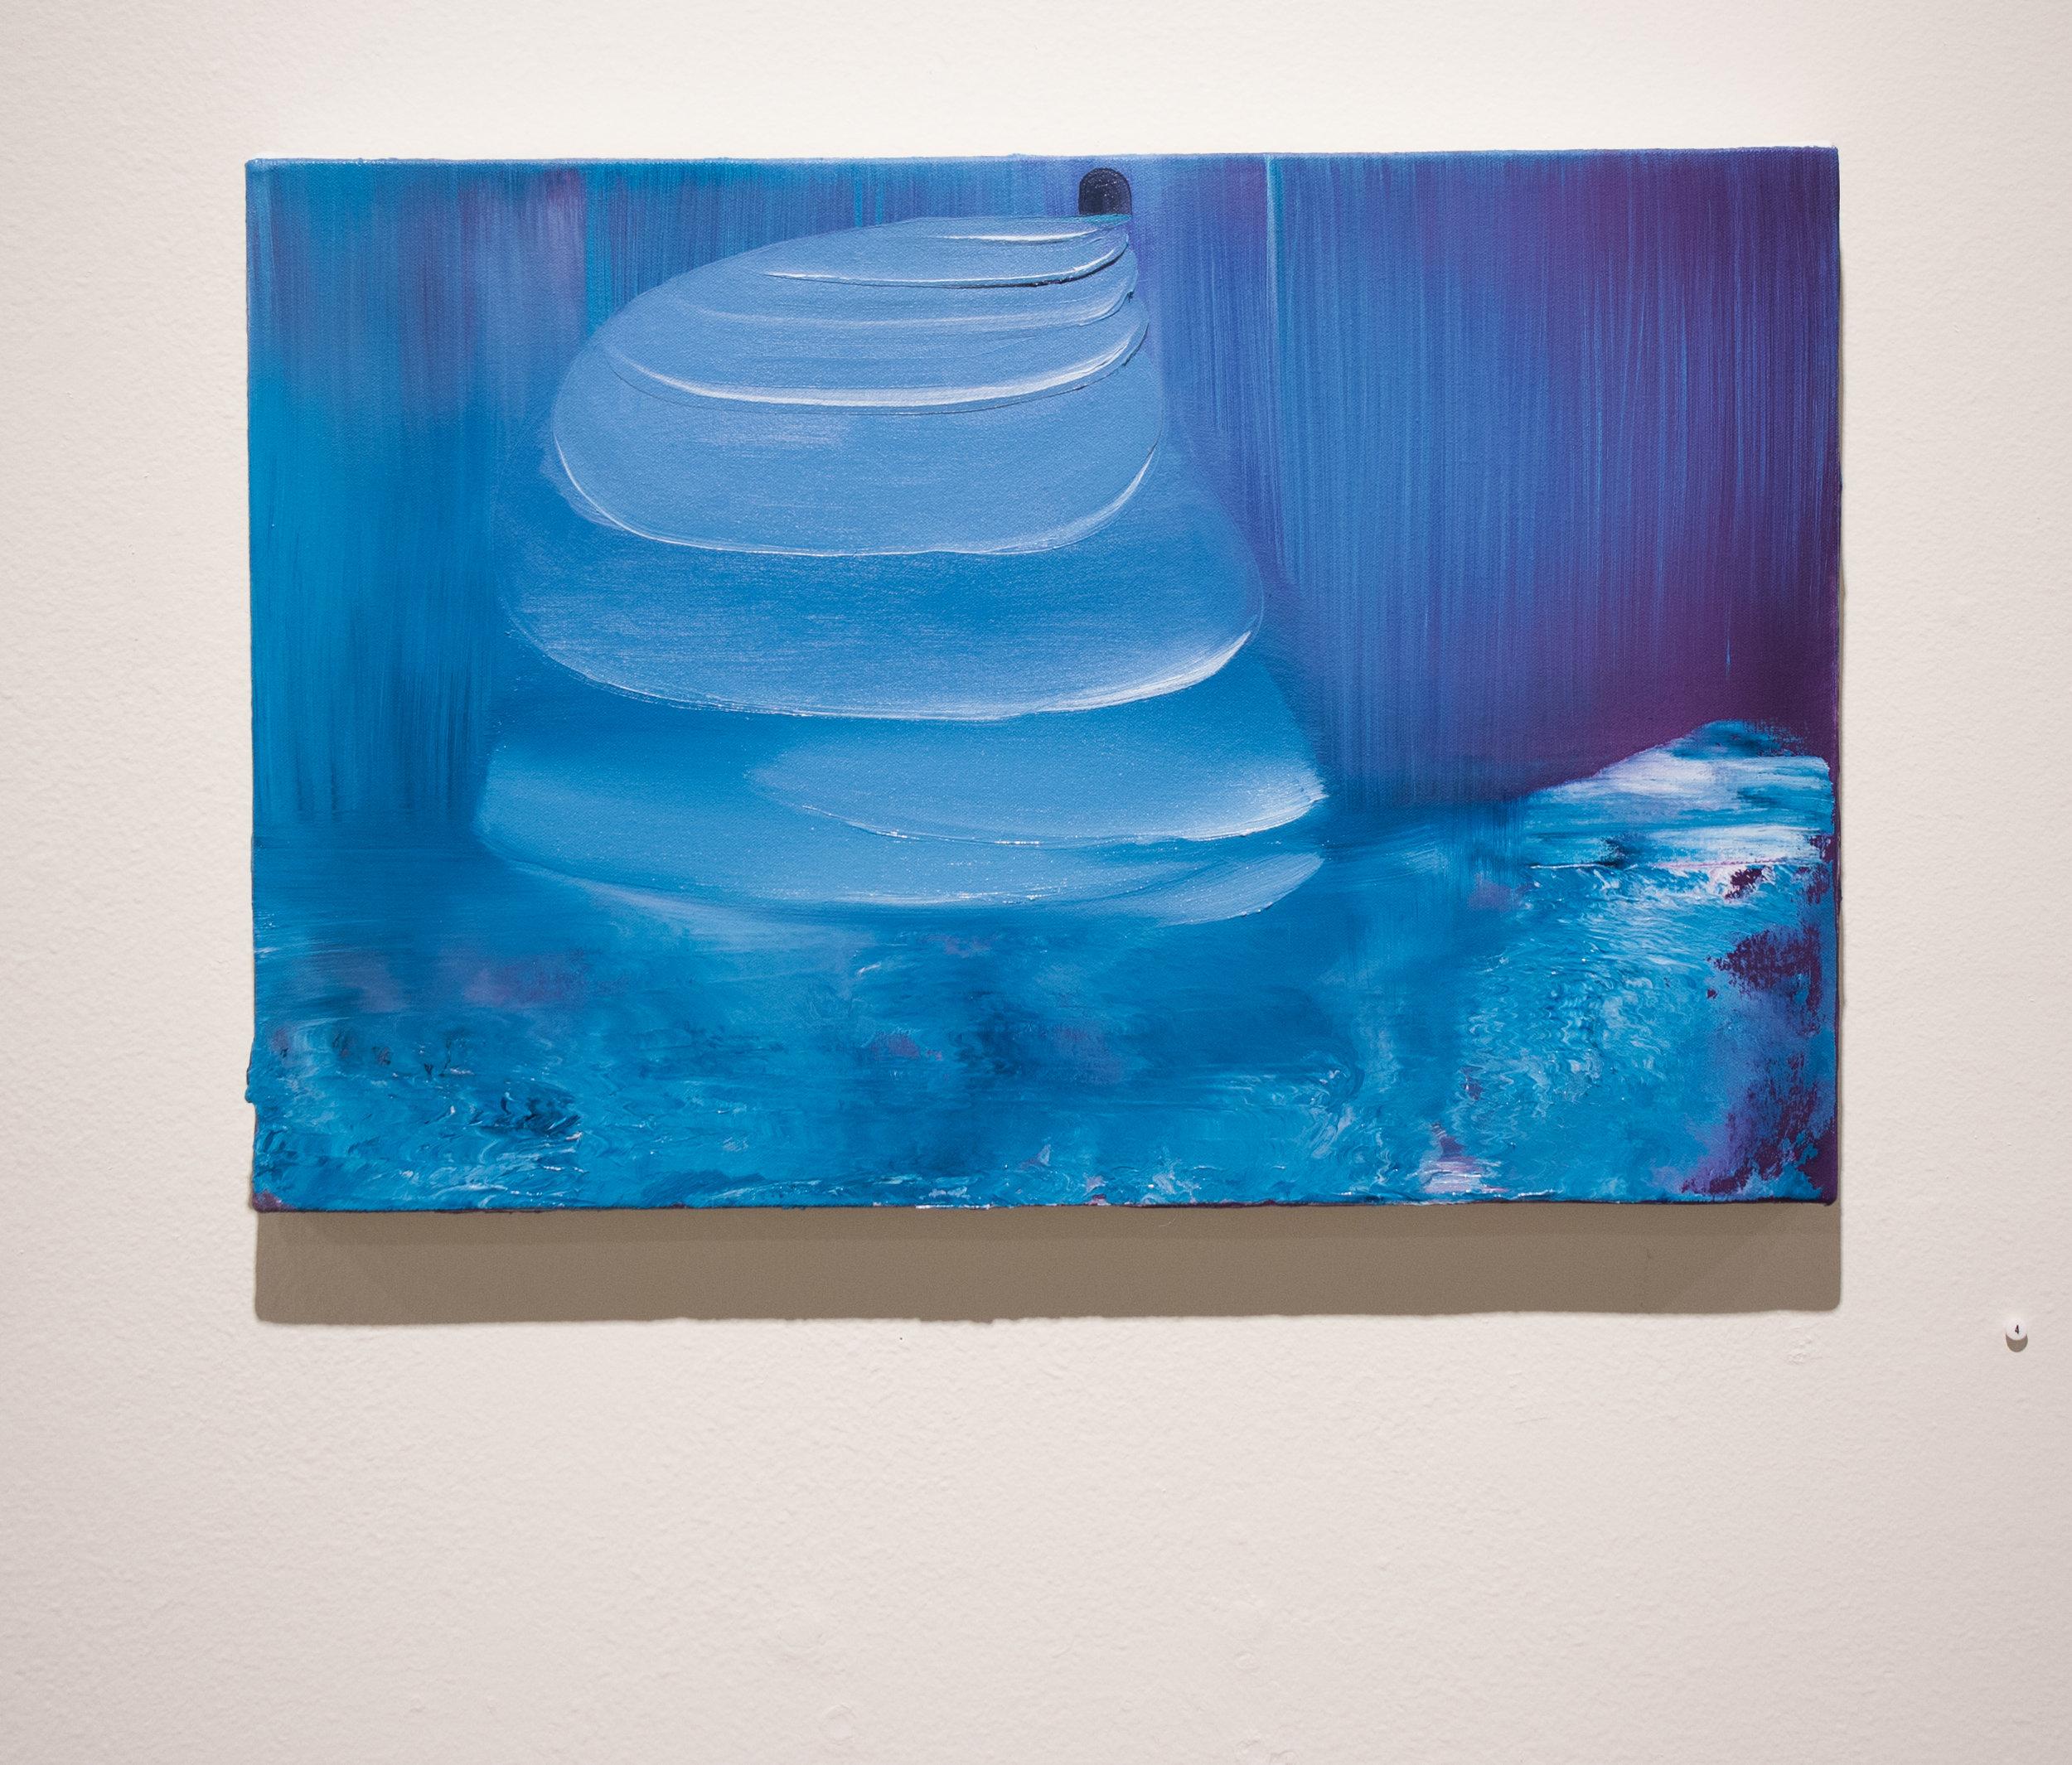 Conor Fagan   Williwaw   2018   oil on canvas   15 x 22.5 in.